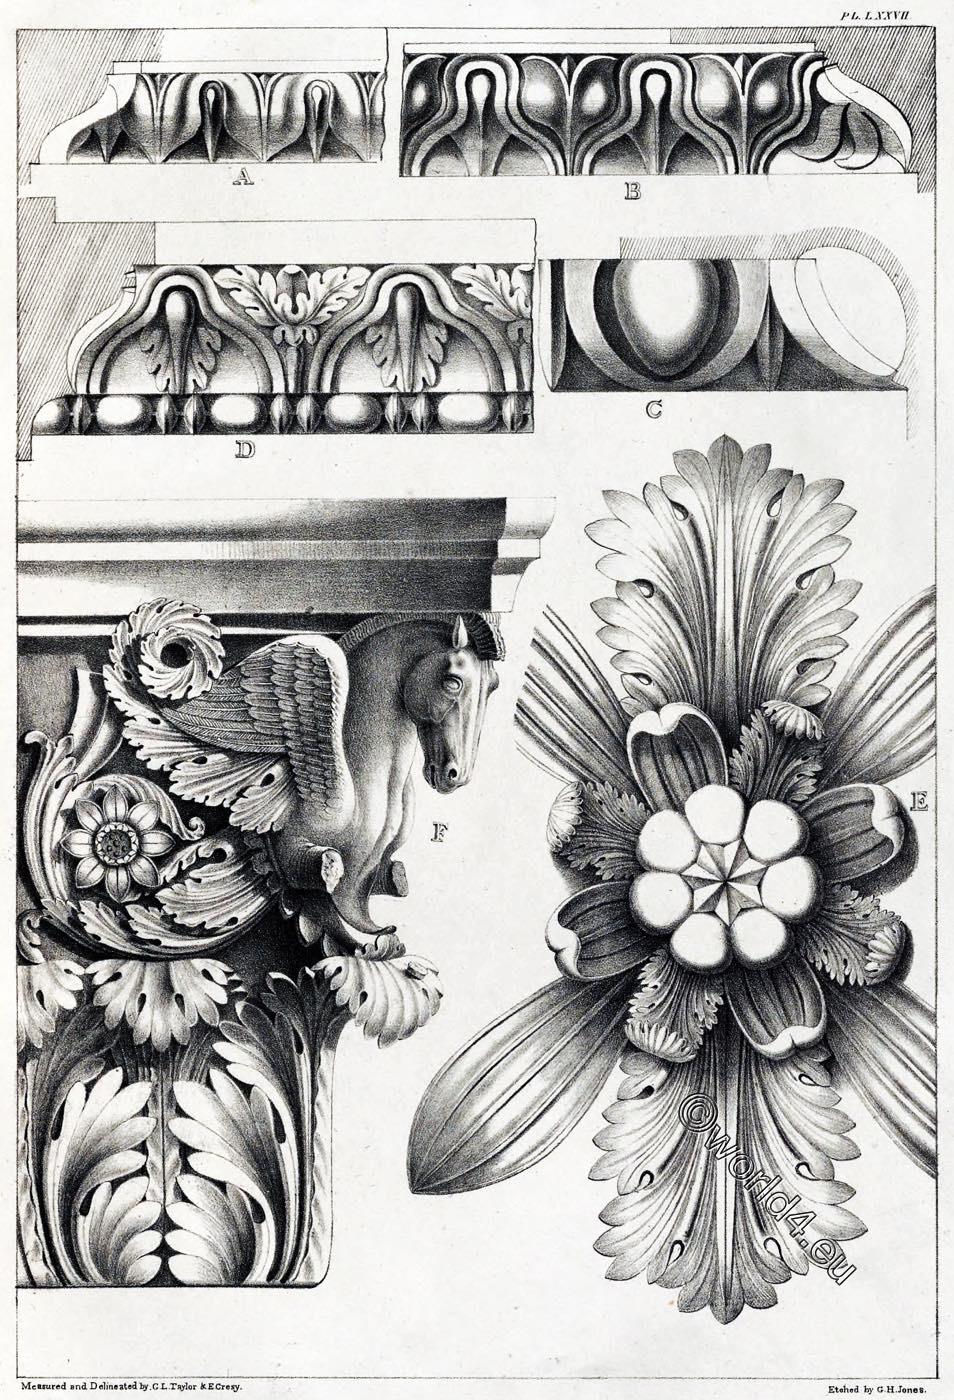 Temple, Mars, Ultor, Rome, Details, Ornament, Decoration, Architecture, antiquities,